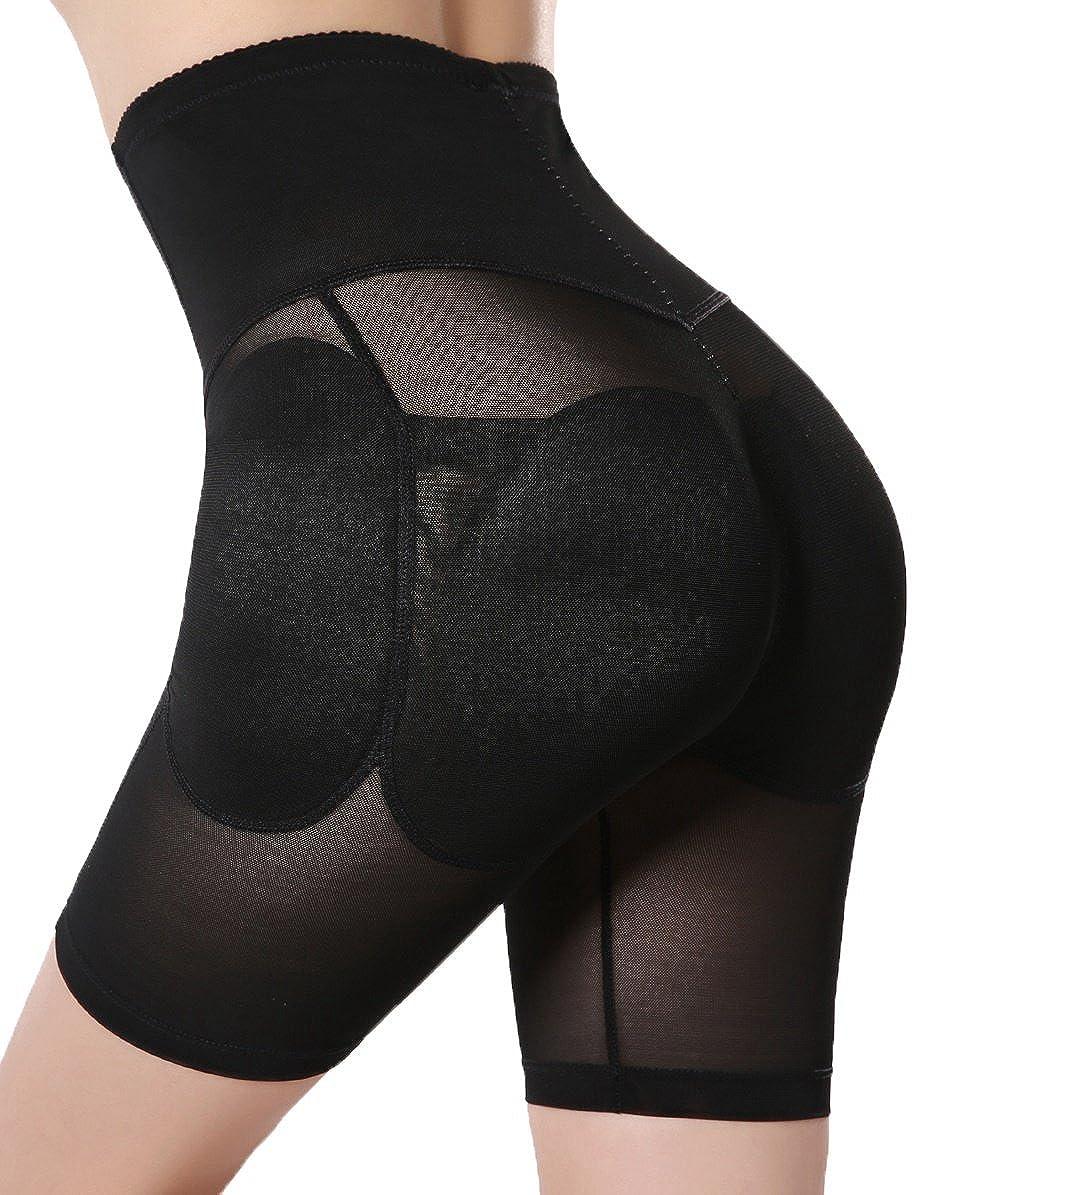 Nicetage Women's Shapewear Butt Lifter Padded Fake Butt Panty Body Shaper C-LF-A82